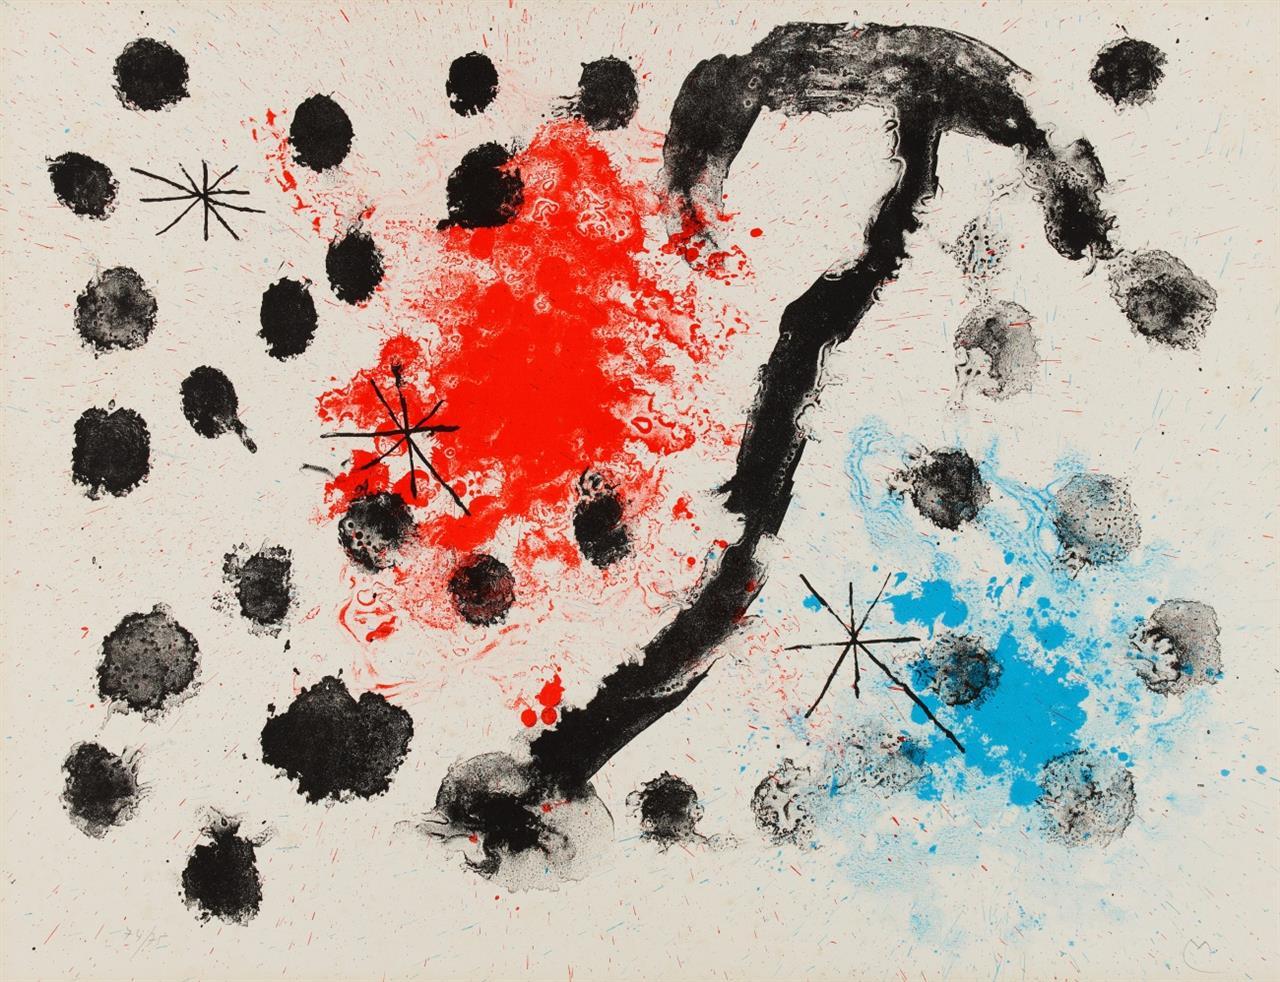 Joan Miró. Aus: Album 19 (pl. 11). 1961. Farblithographie. Monogrammiert. Ex. 74/75. Maeght 322.